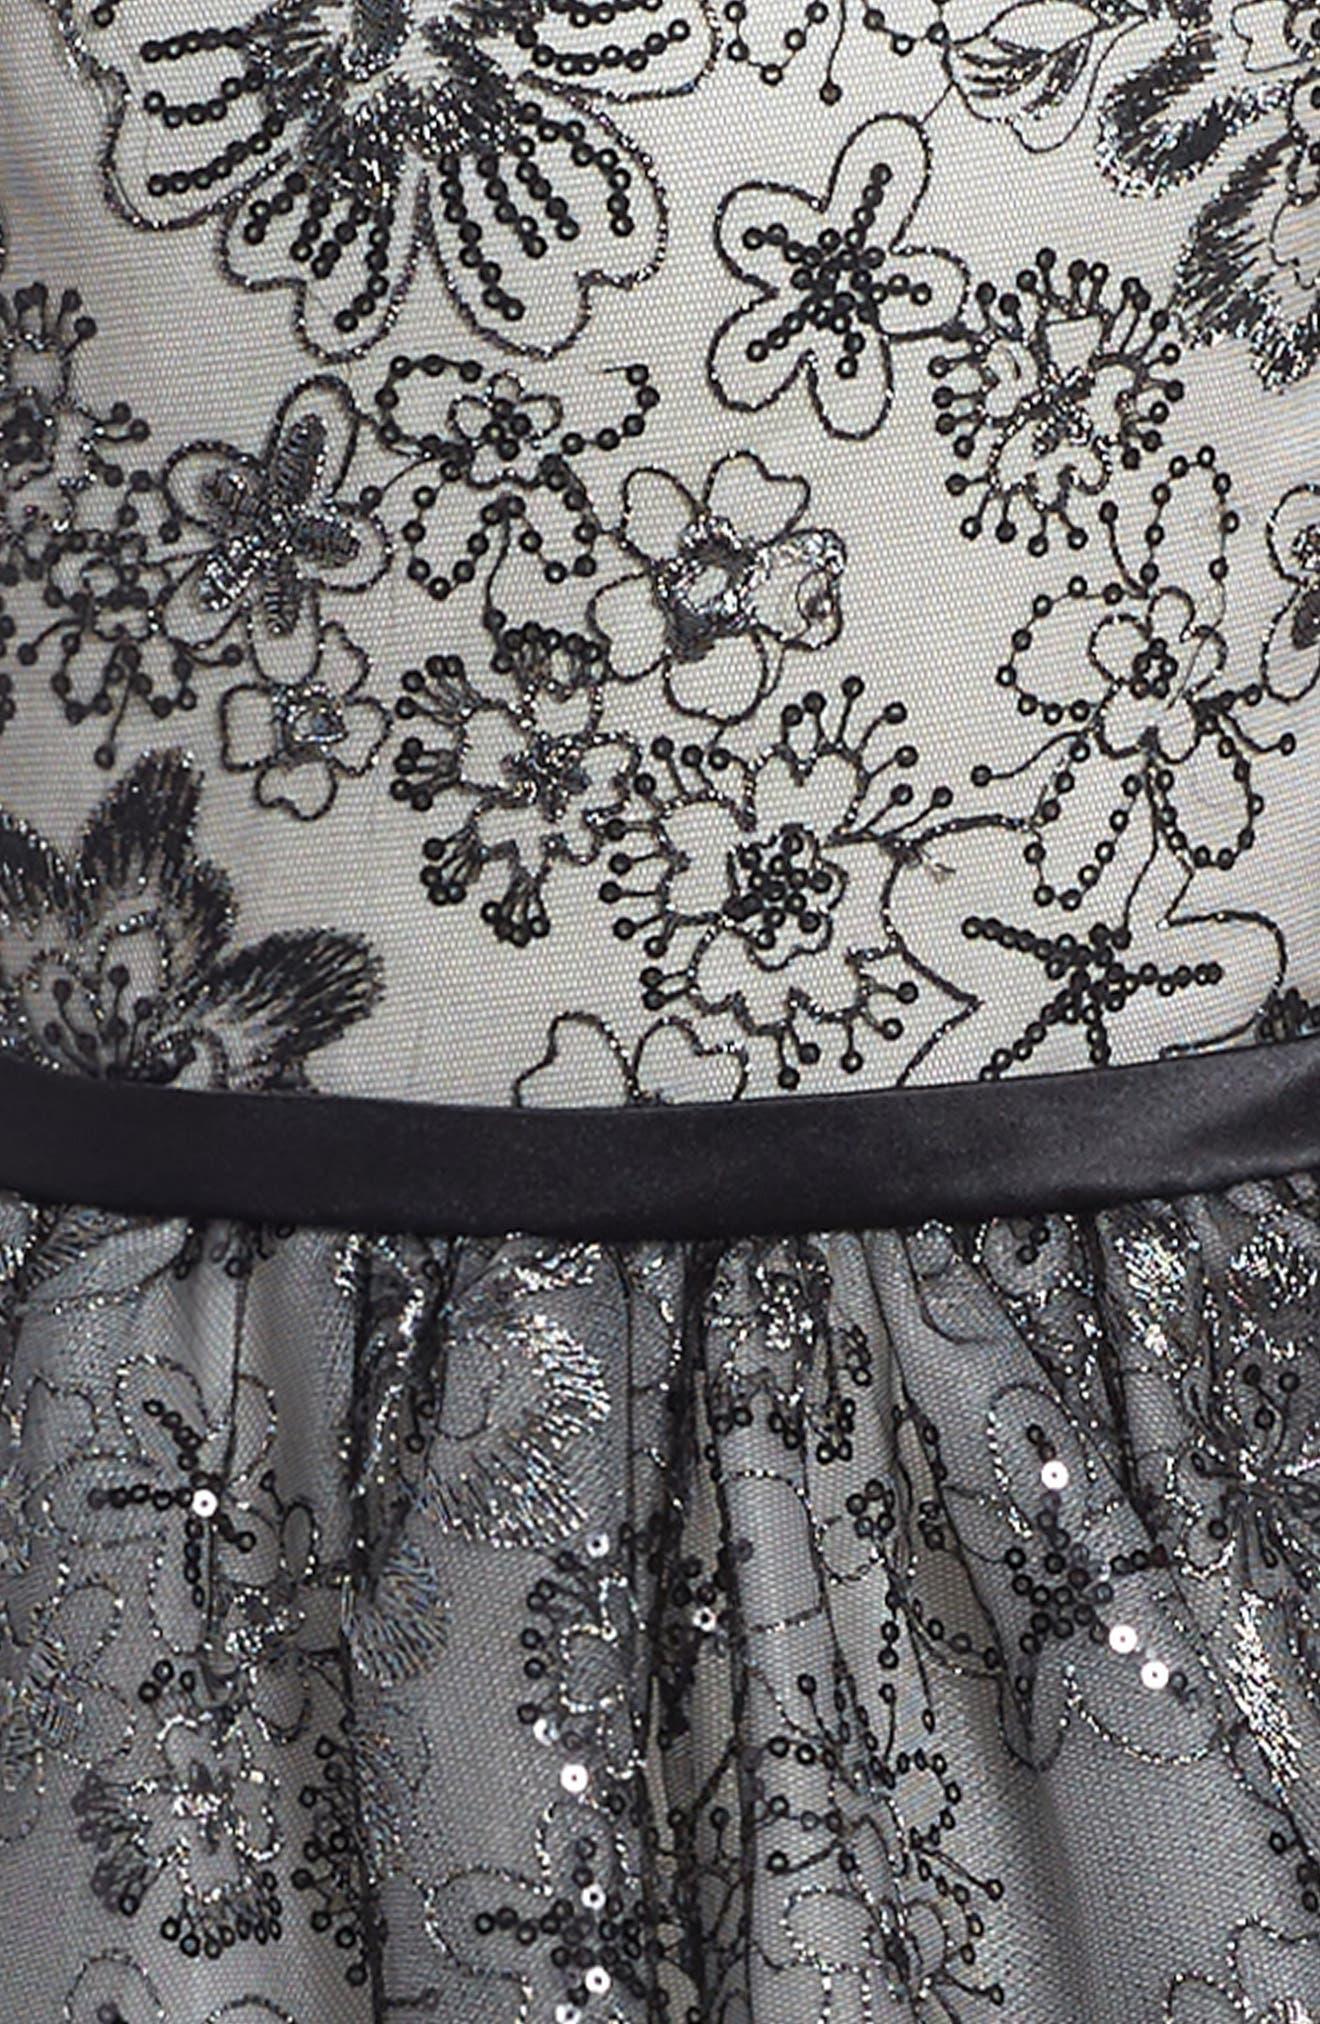 Sequin & Lace Dress,                             Alternate thumbnail 3, color,                             Black/ Ivory